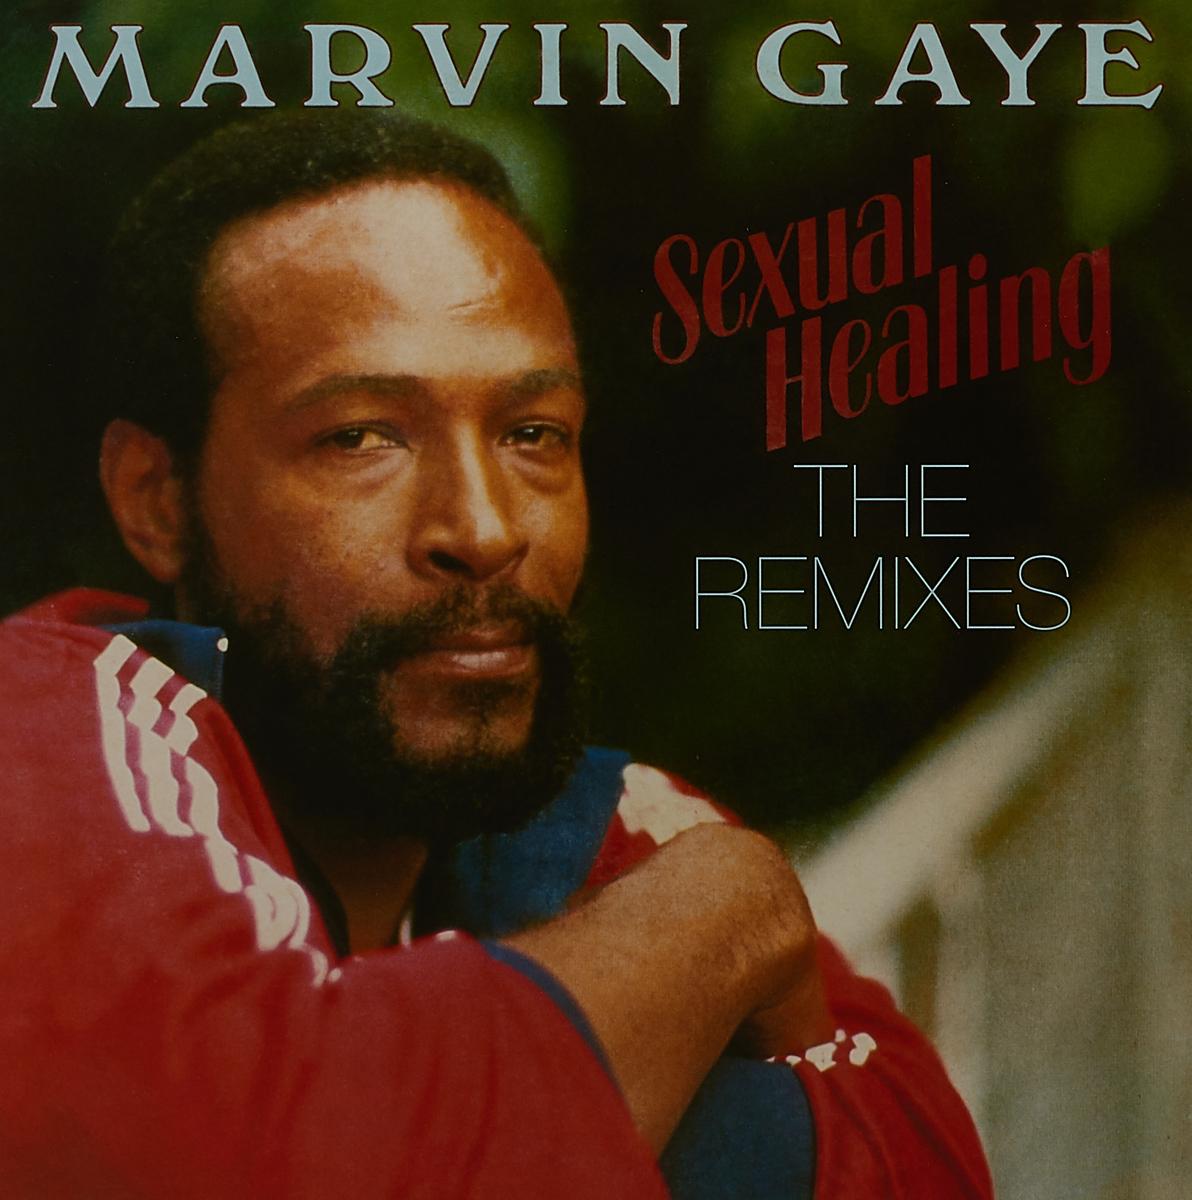 Марвин Гэй Marvin Gaye. Sexual Healing: The Remixes (LP) марвин гэй marvin gaye volume jne 1961 1965 7 lp